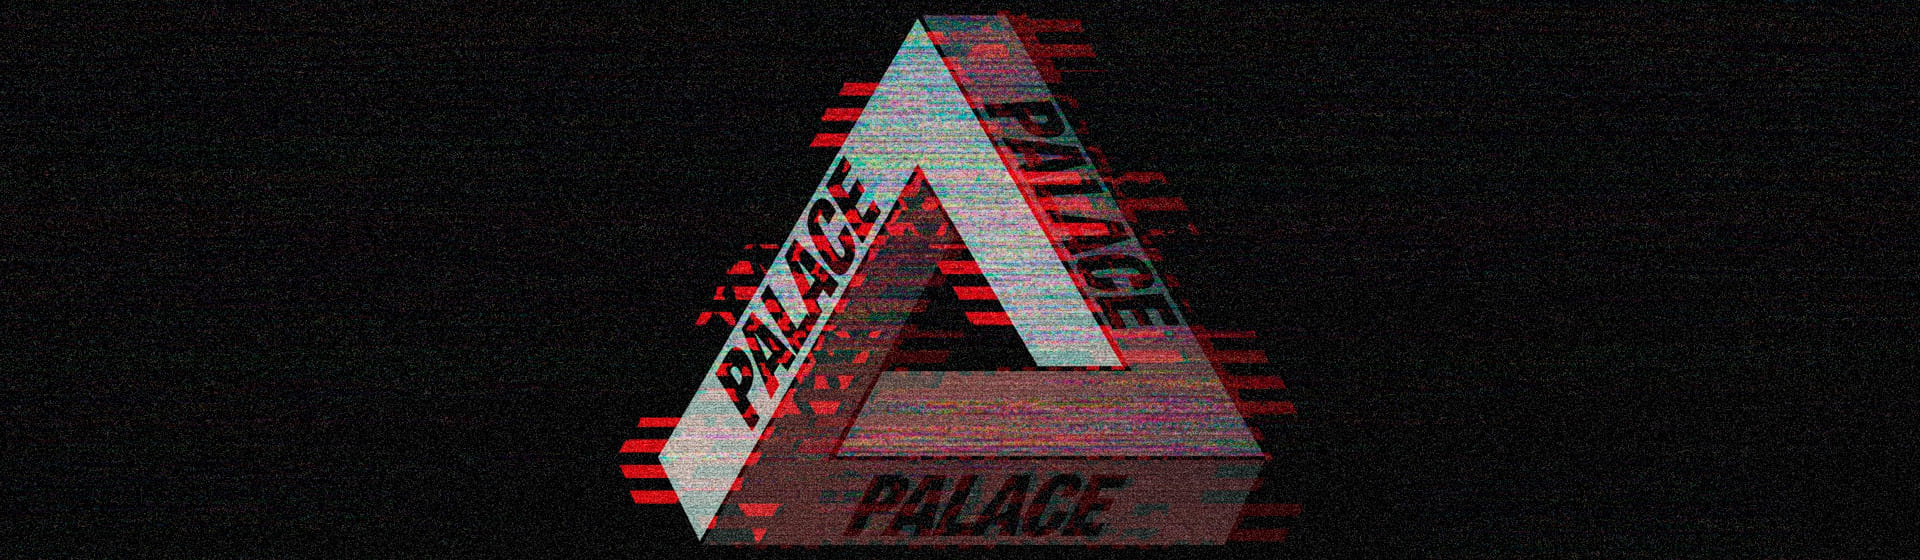 Palace - Женские толстовки